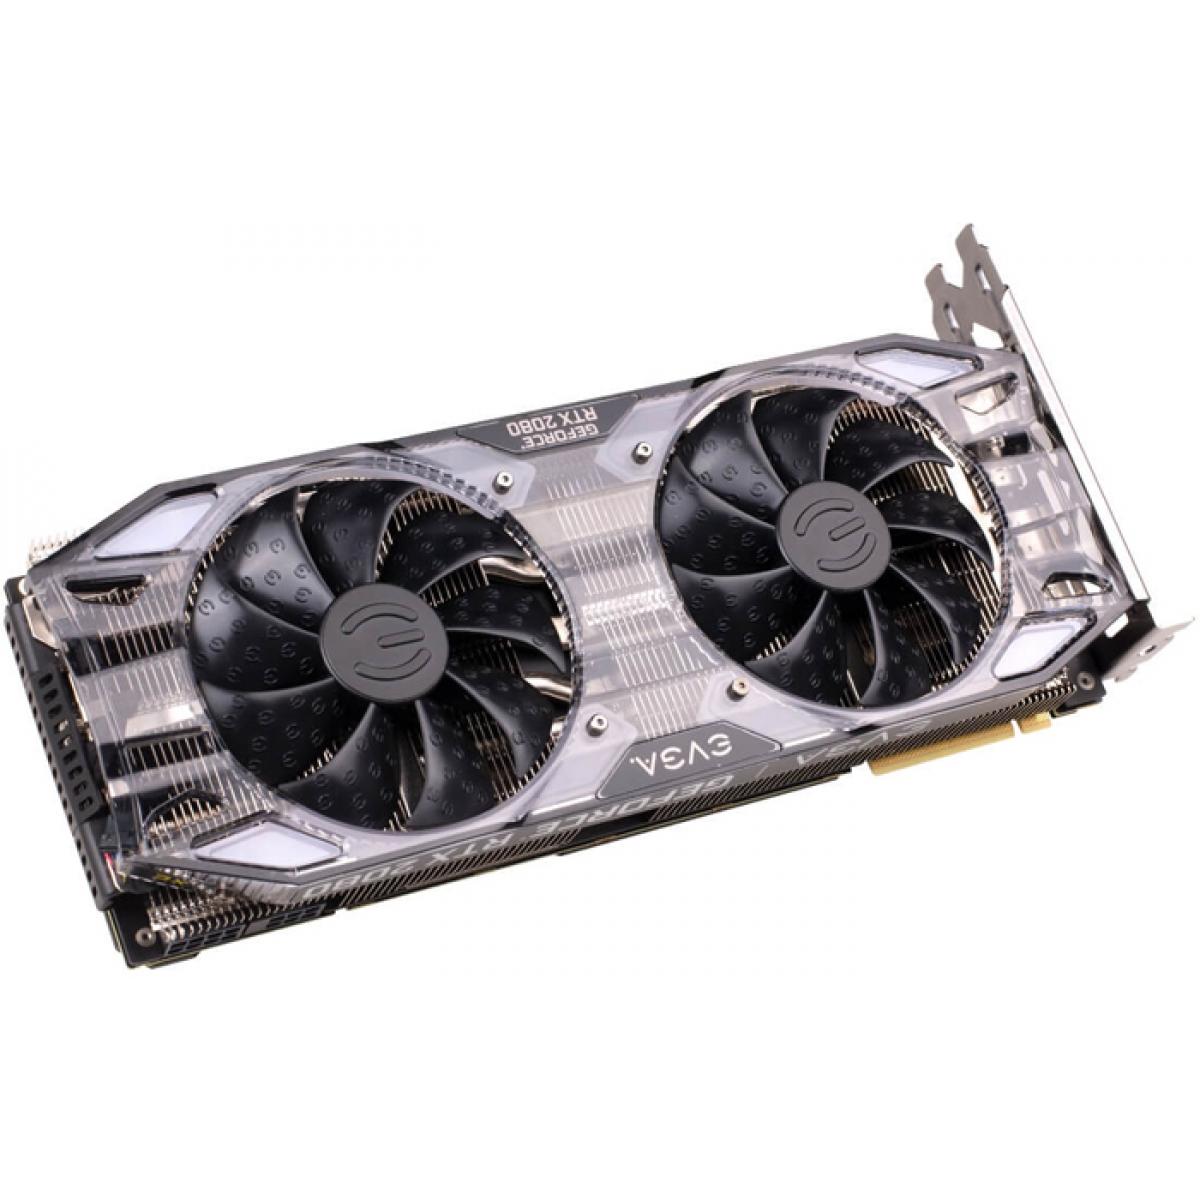 Placa de Vídeo EVGA Geforce RTX 2080 XC Gaming Dual, 8GB GDDR6, 256Bit